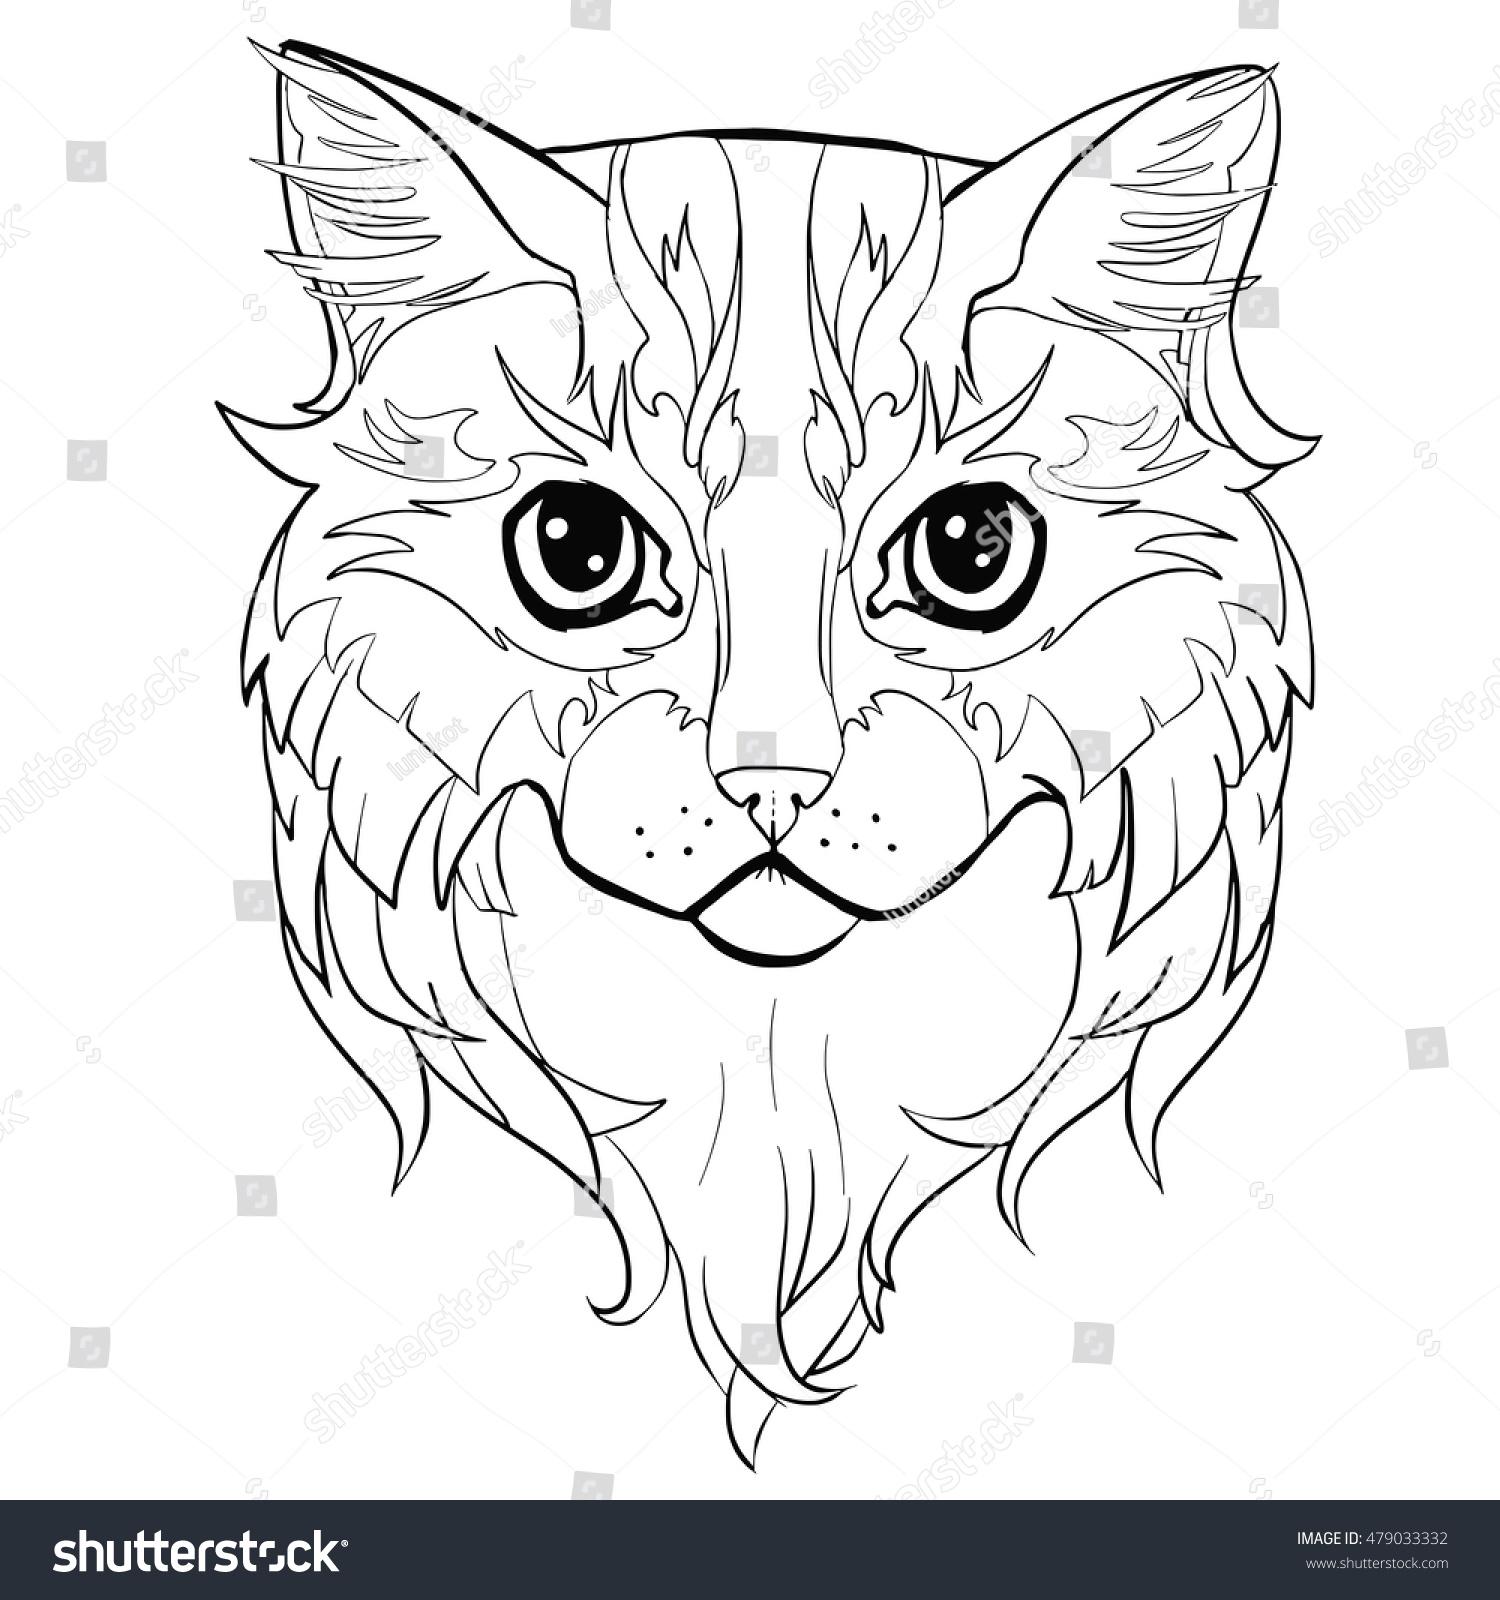 Cat Head Hand Drawn Coloring Cat Stock Vector 479033332 ...